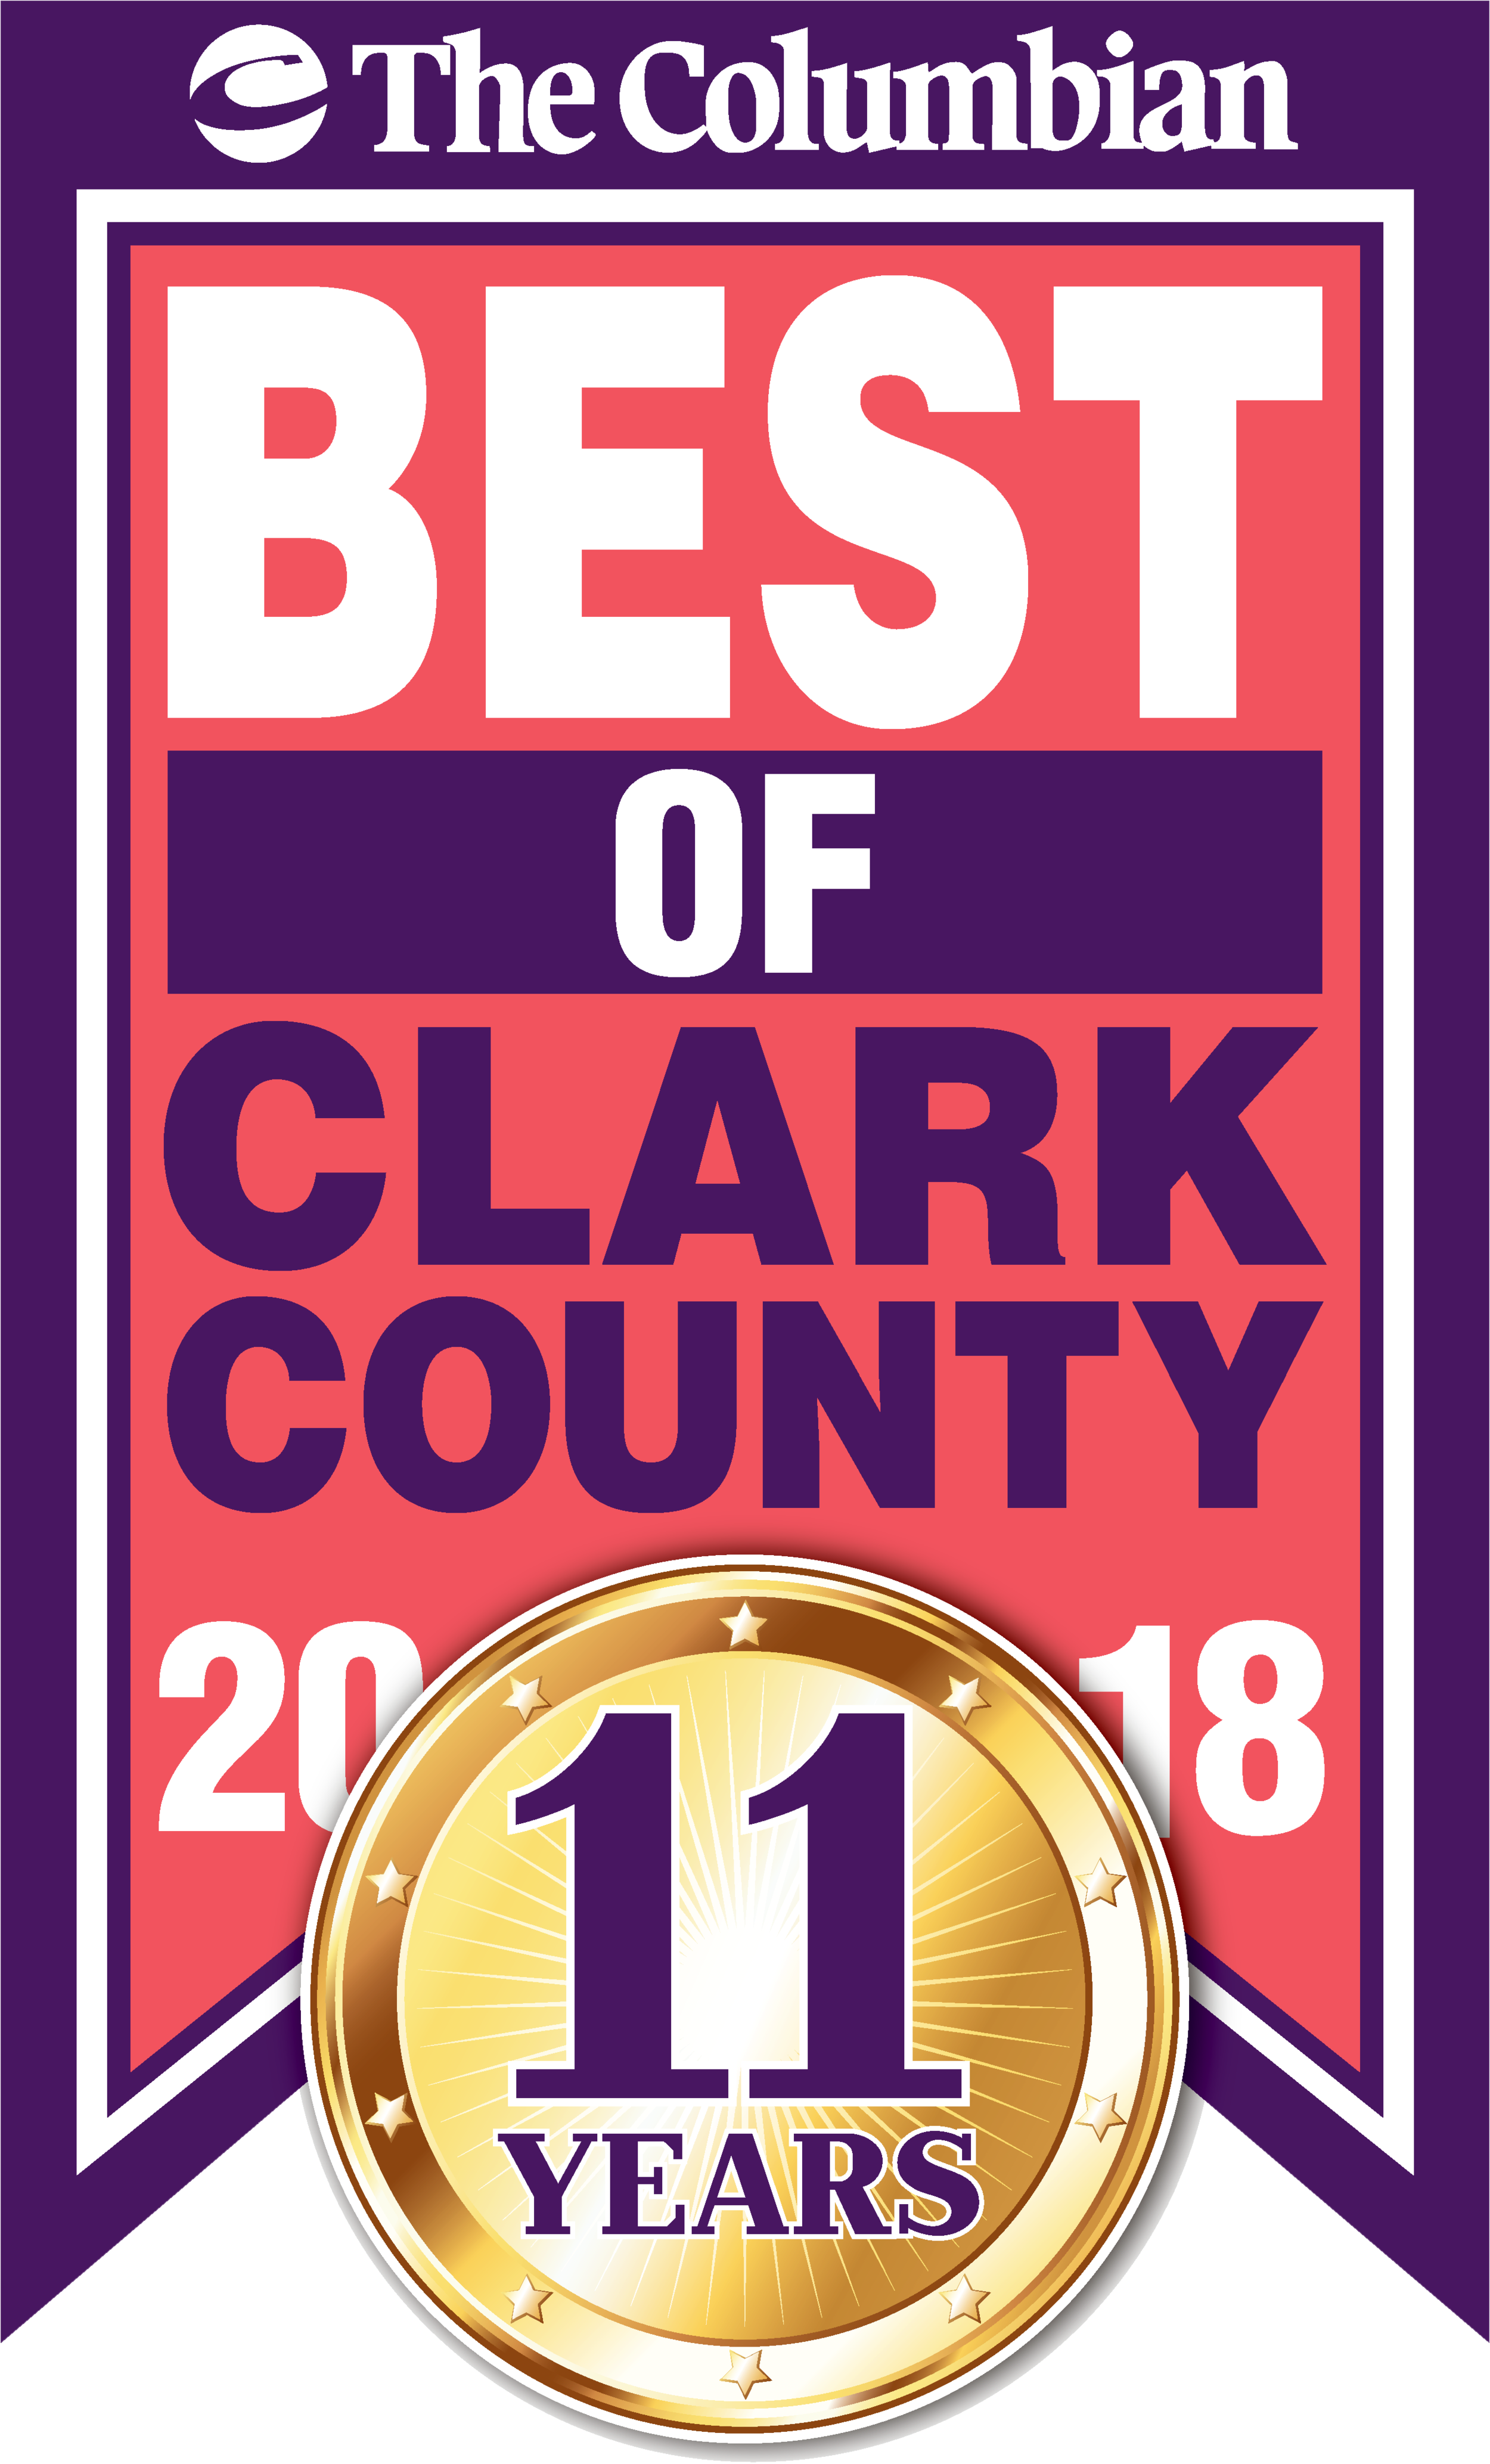 Landerholm-PS-Best-in-Clark-County-2018